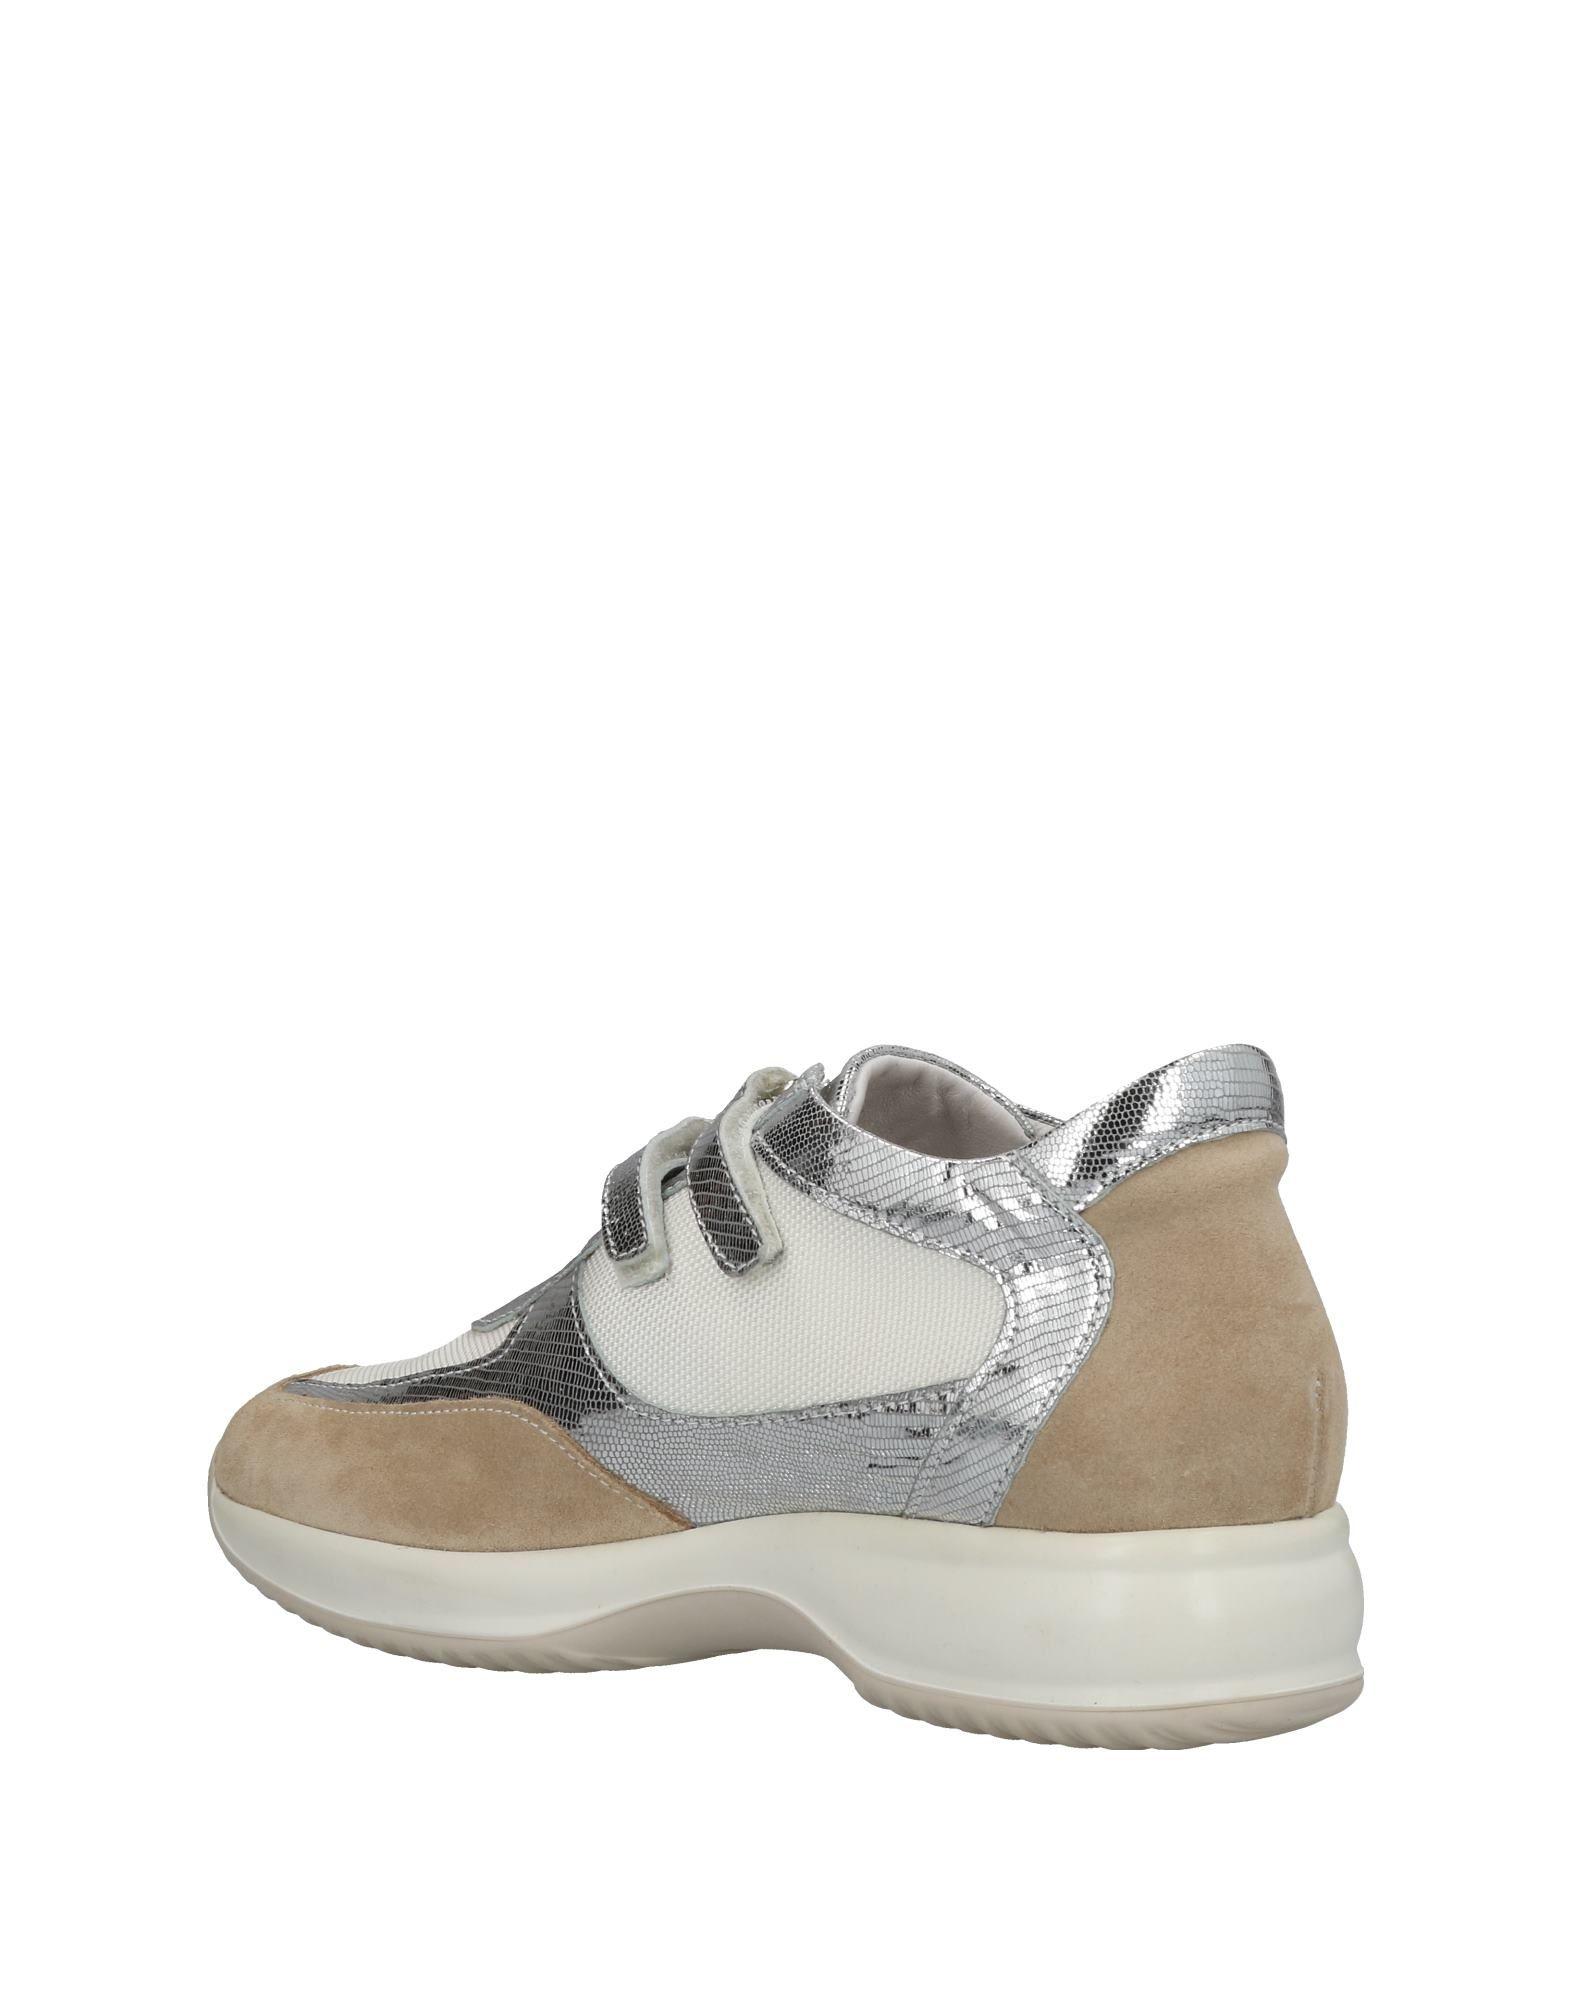 Sneakers Hornet By Botticelli Femme - Sneakers Hornet By Botticelli sur